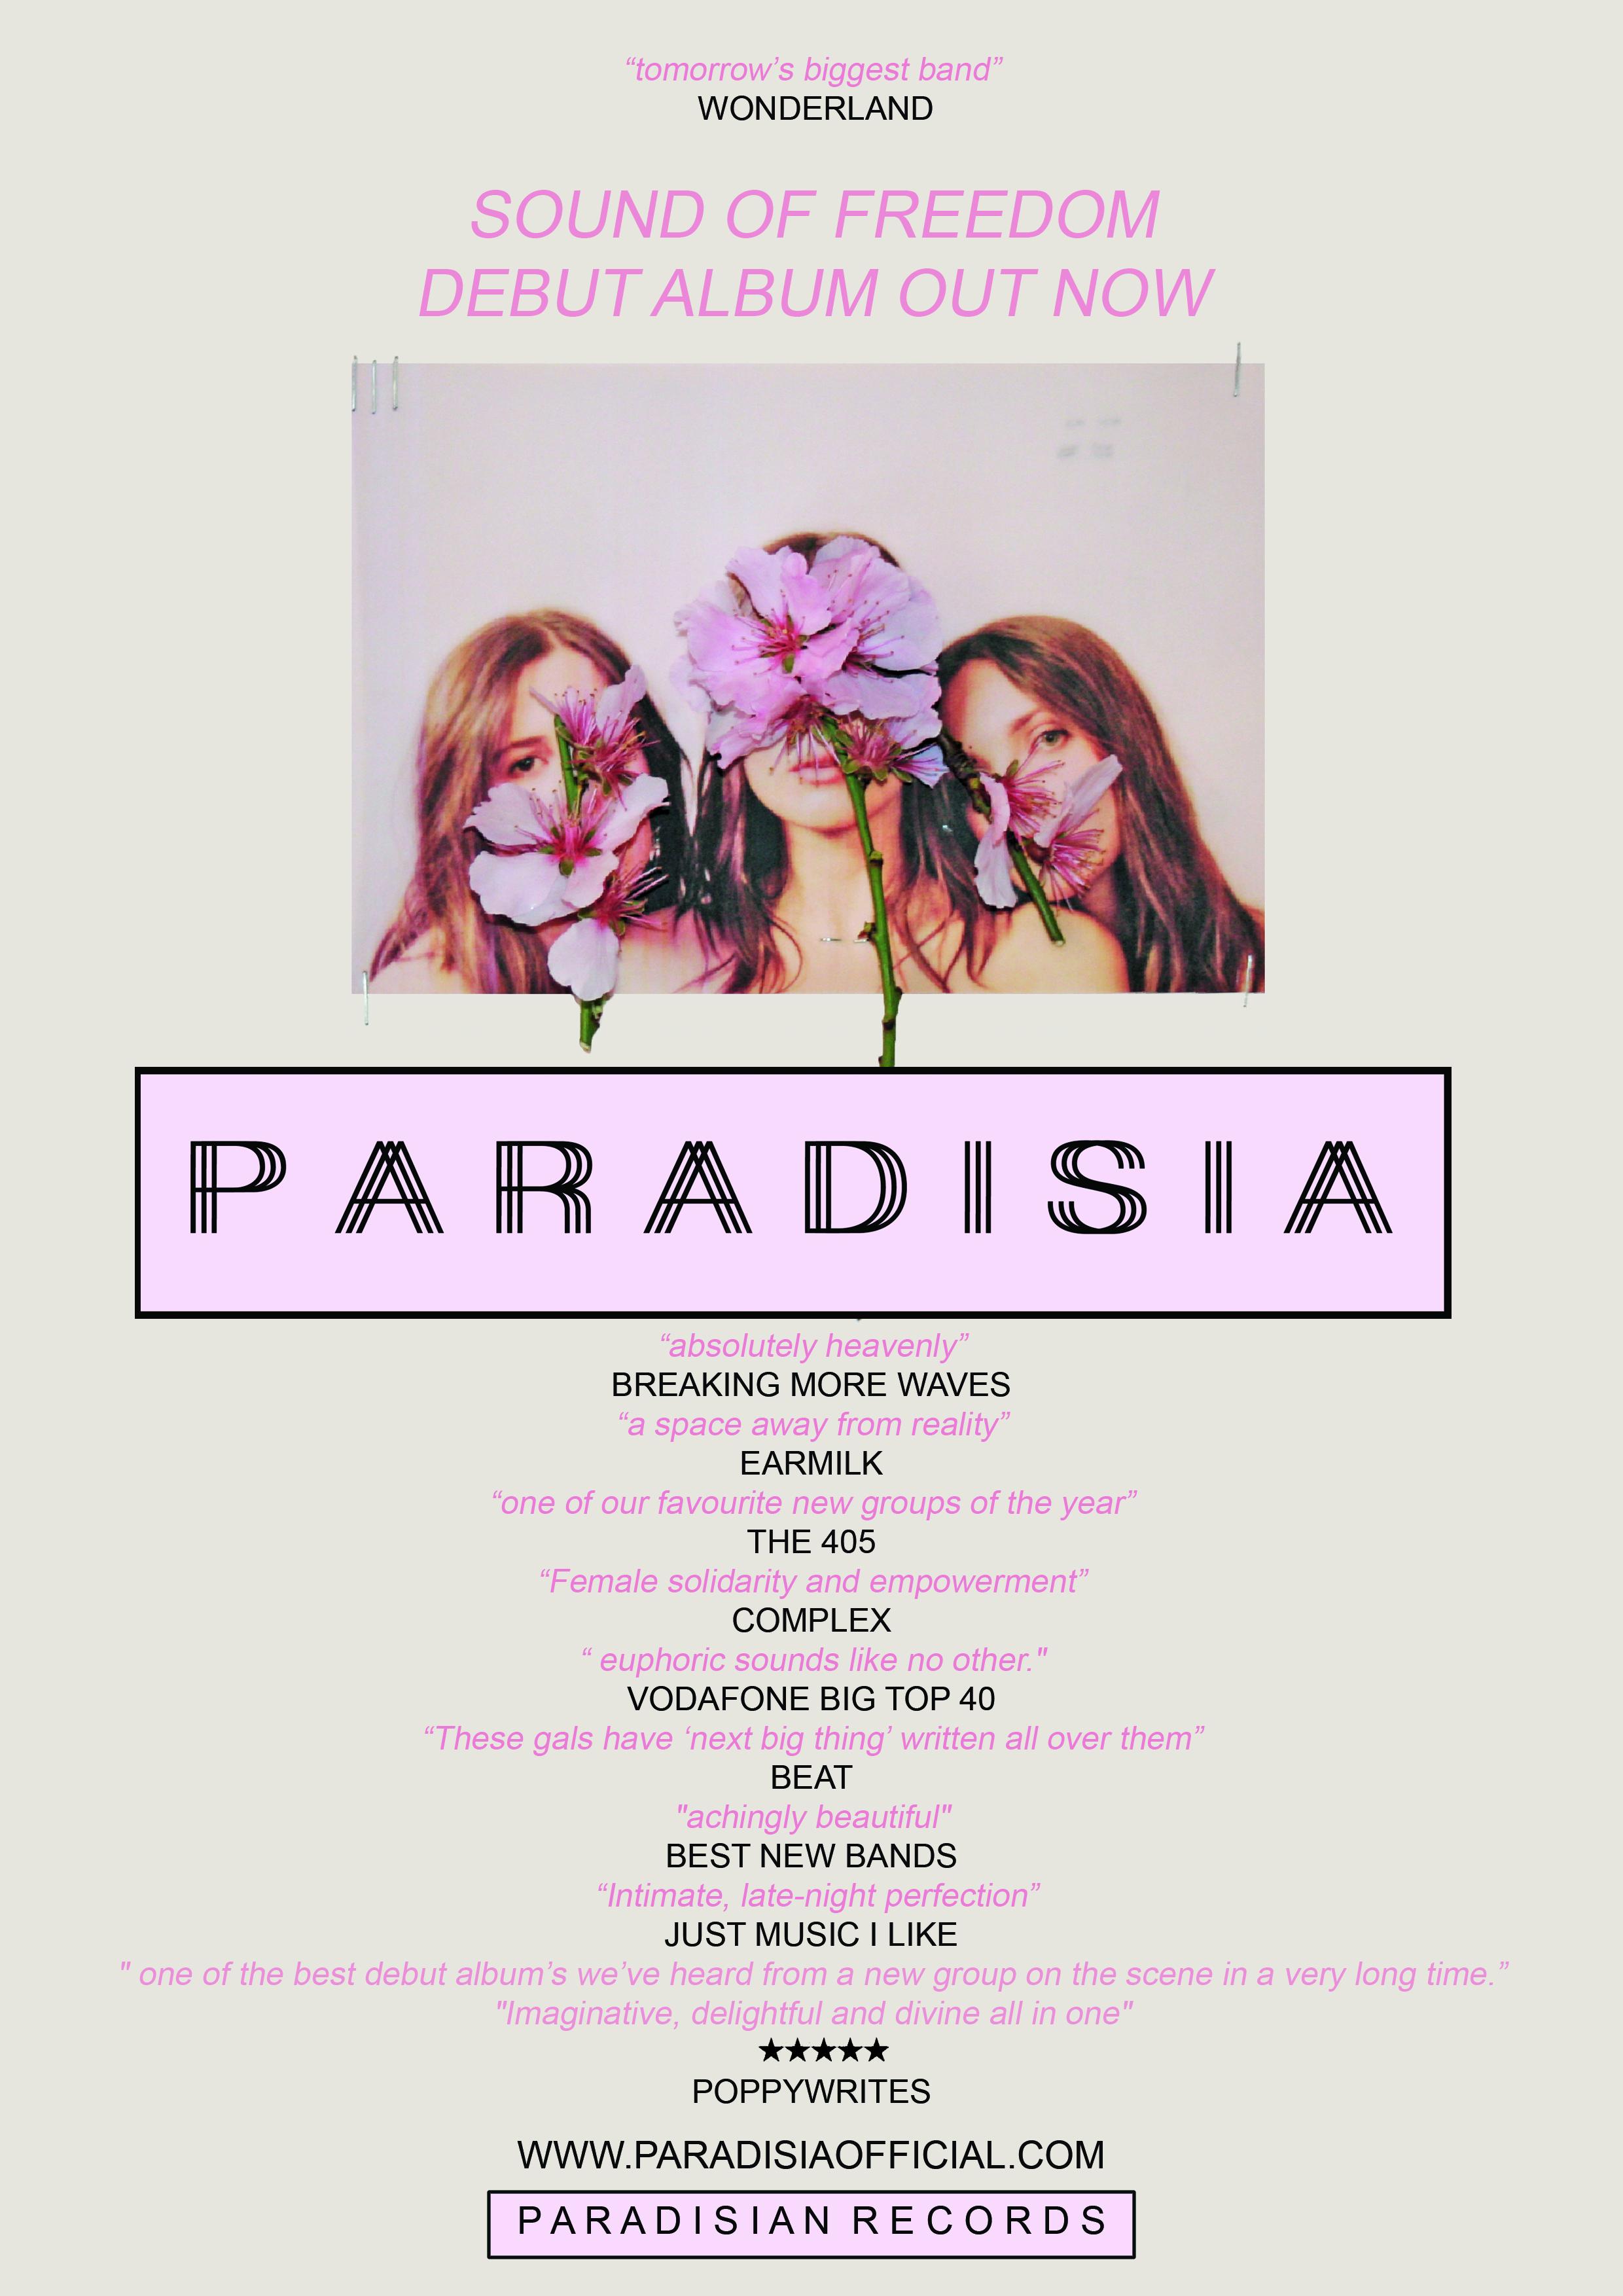 PARADISIA ALBUM POSTER 6 july 2017.jpg